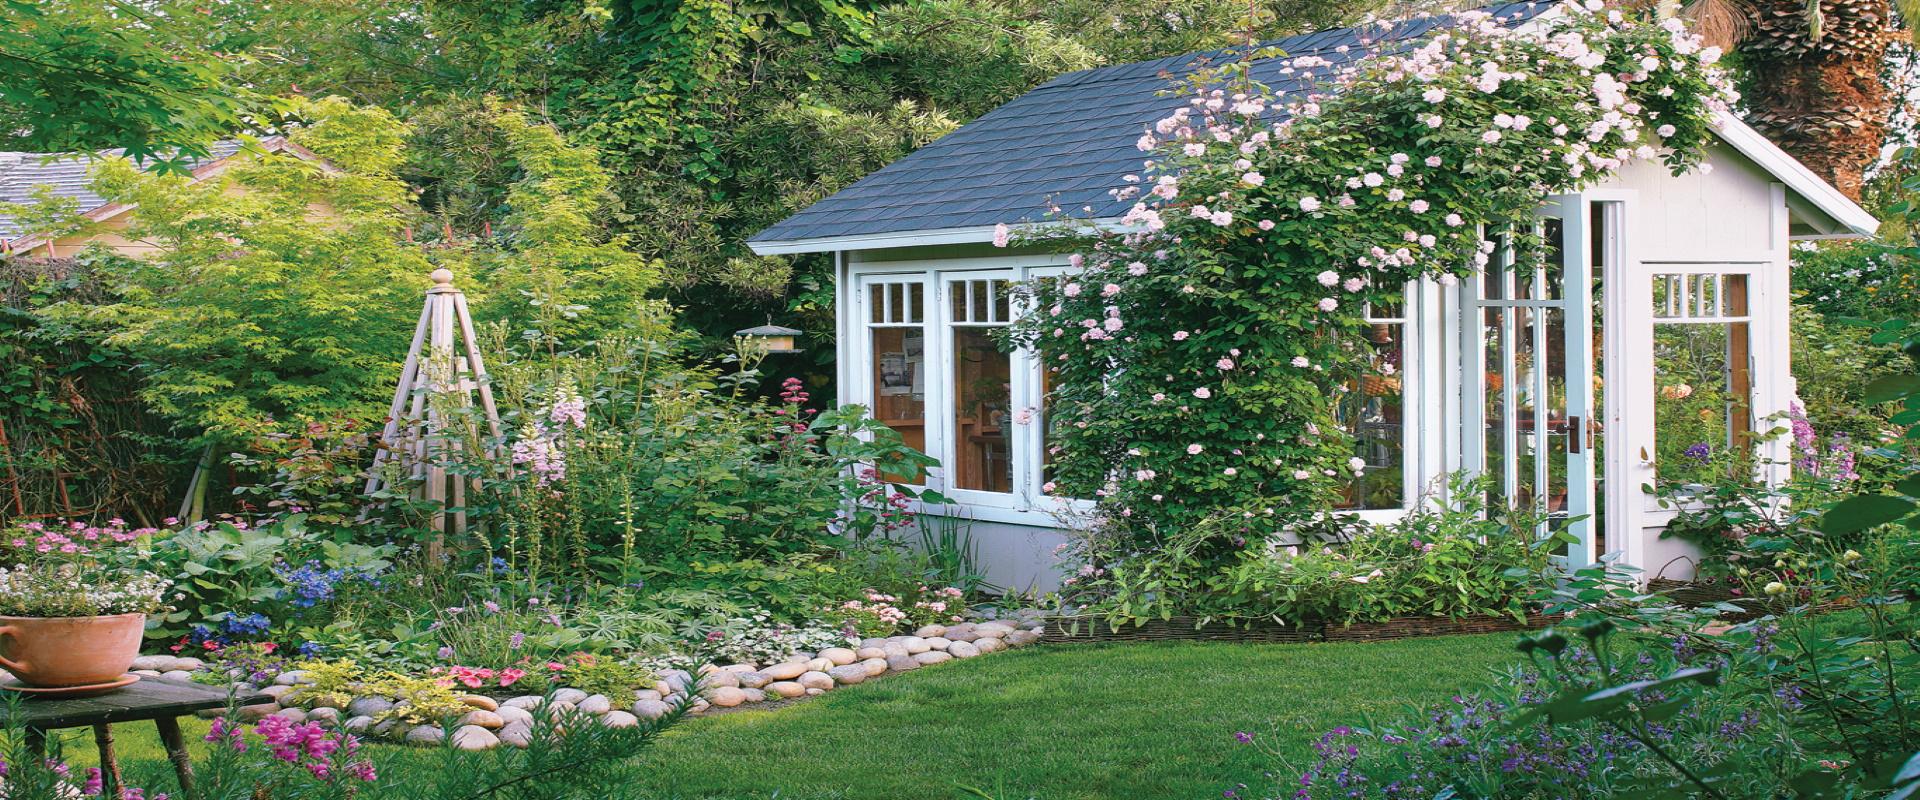 Real Estate - Lawn